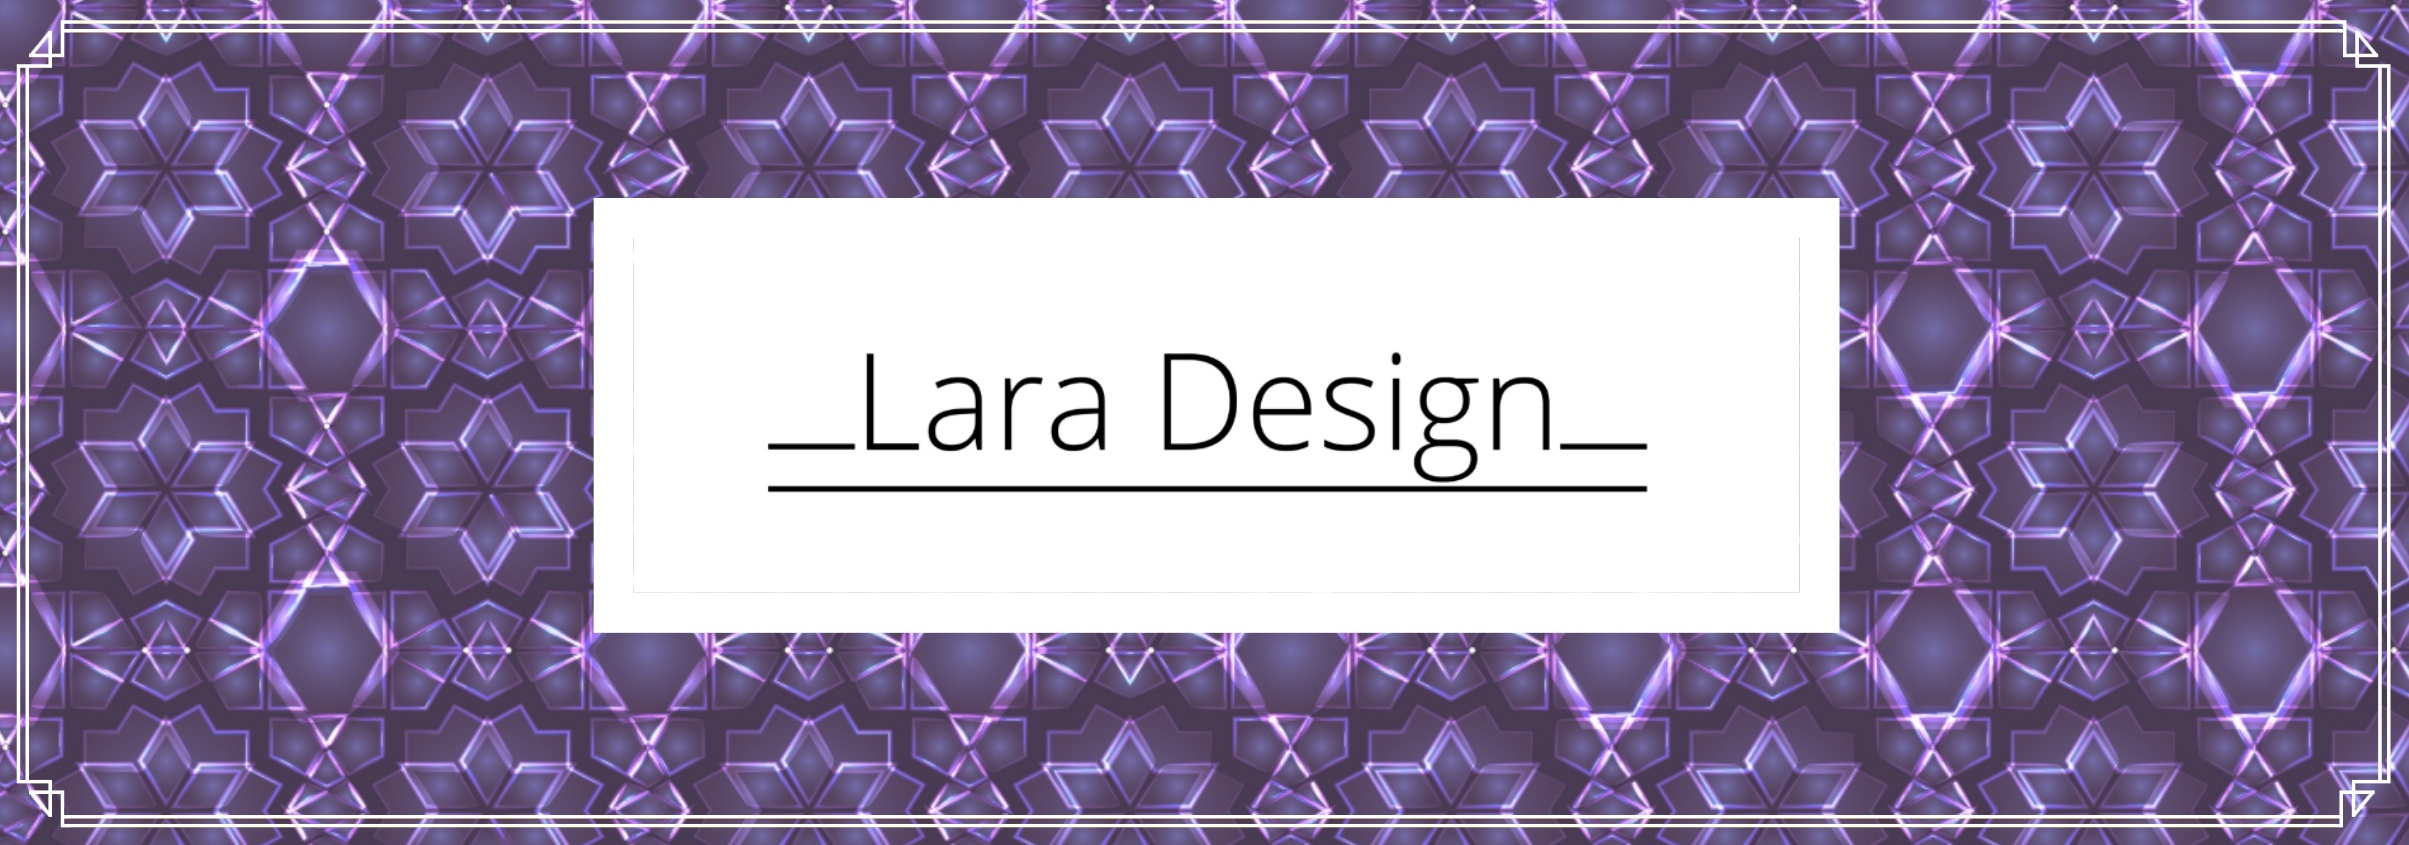 logo Lara Design - Banner